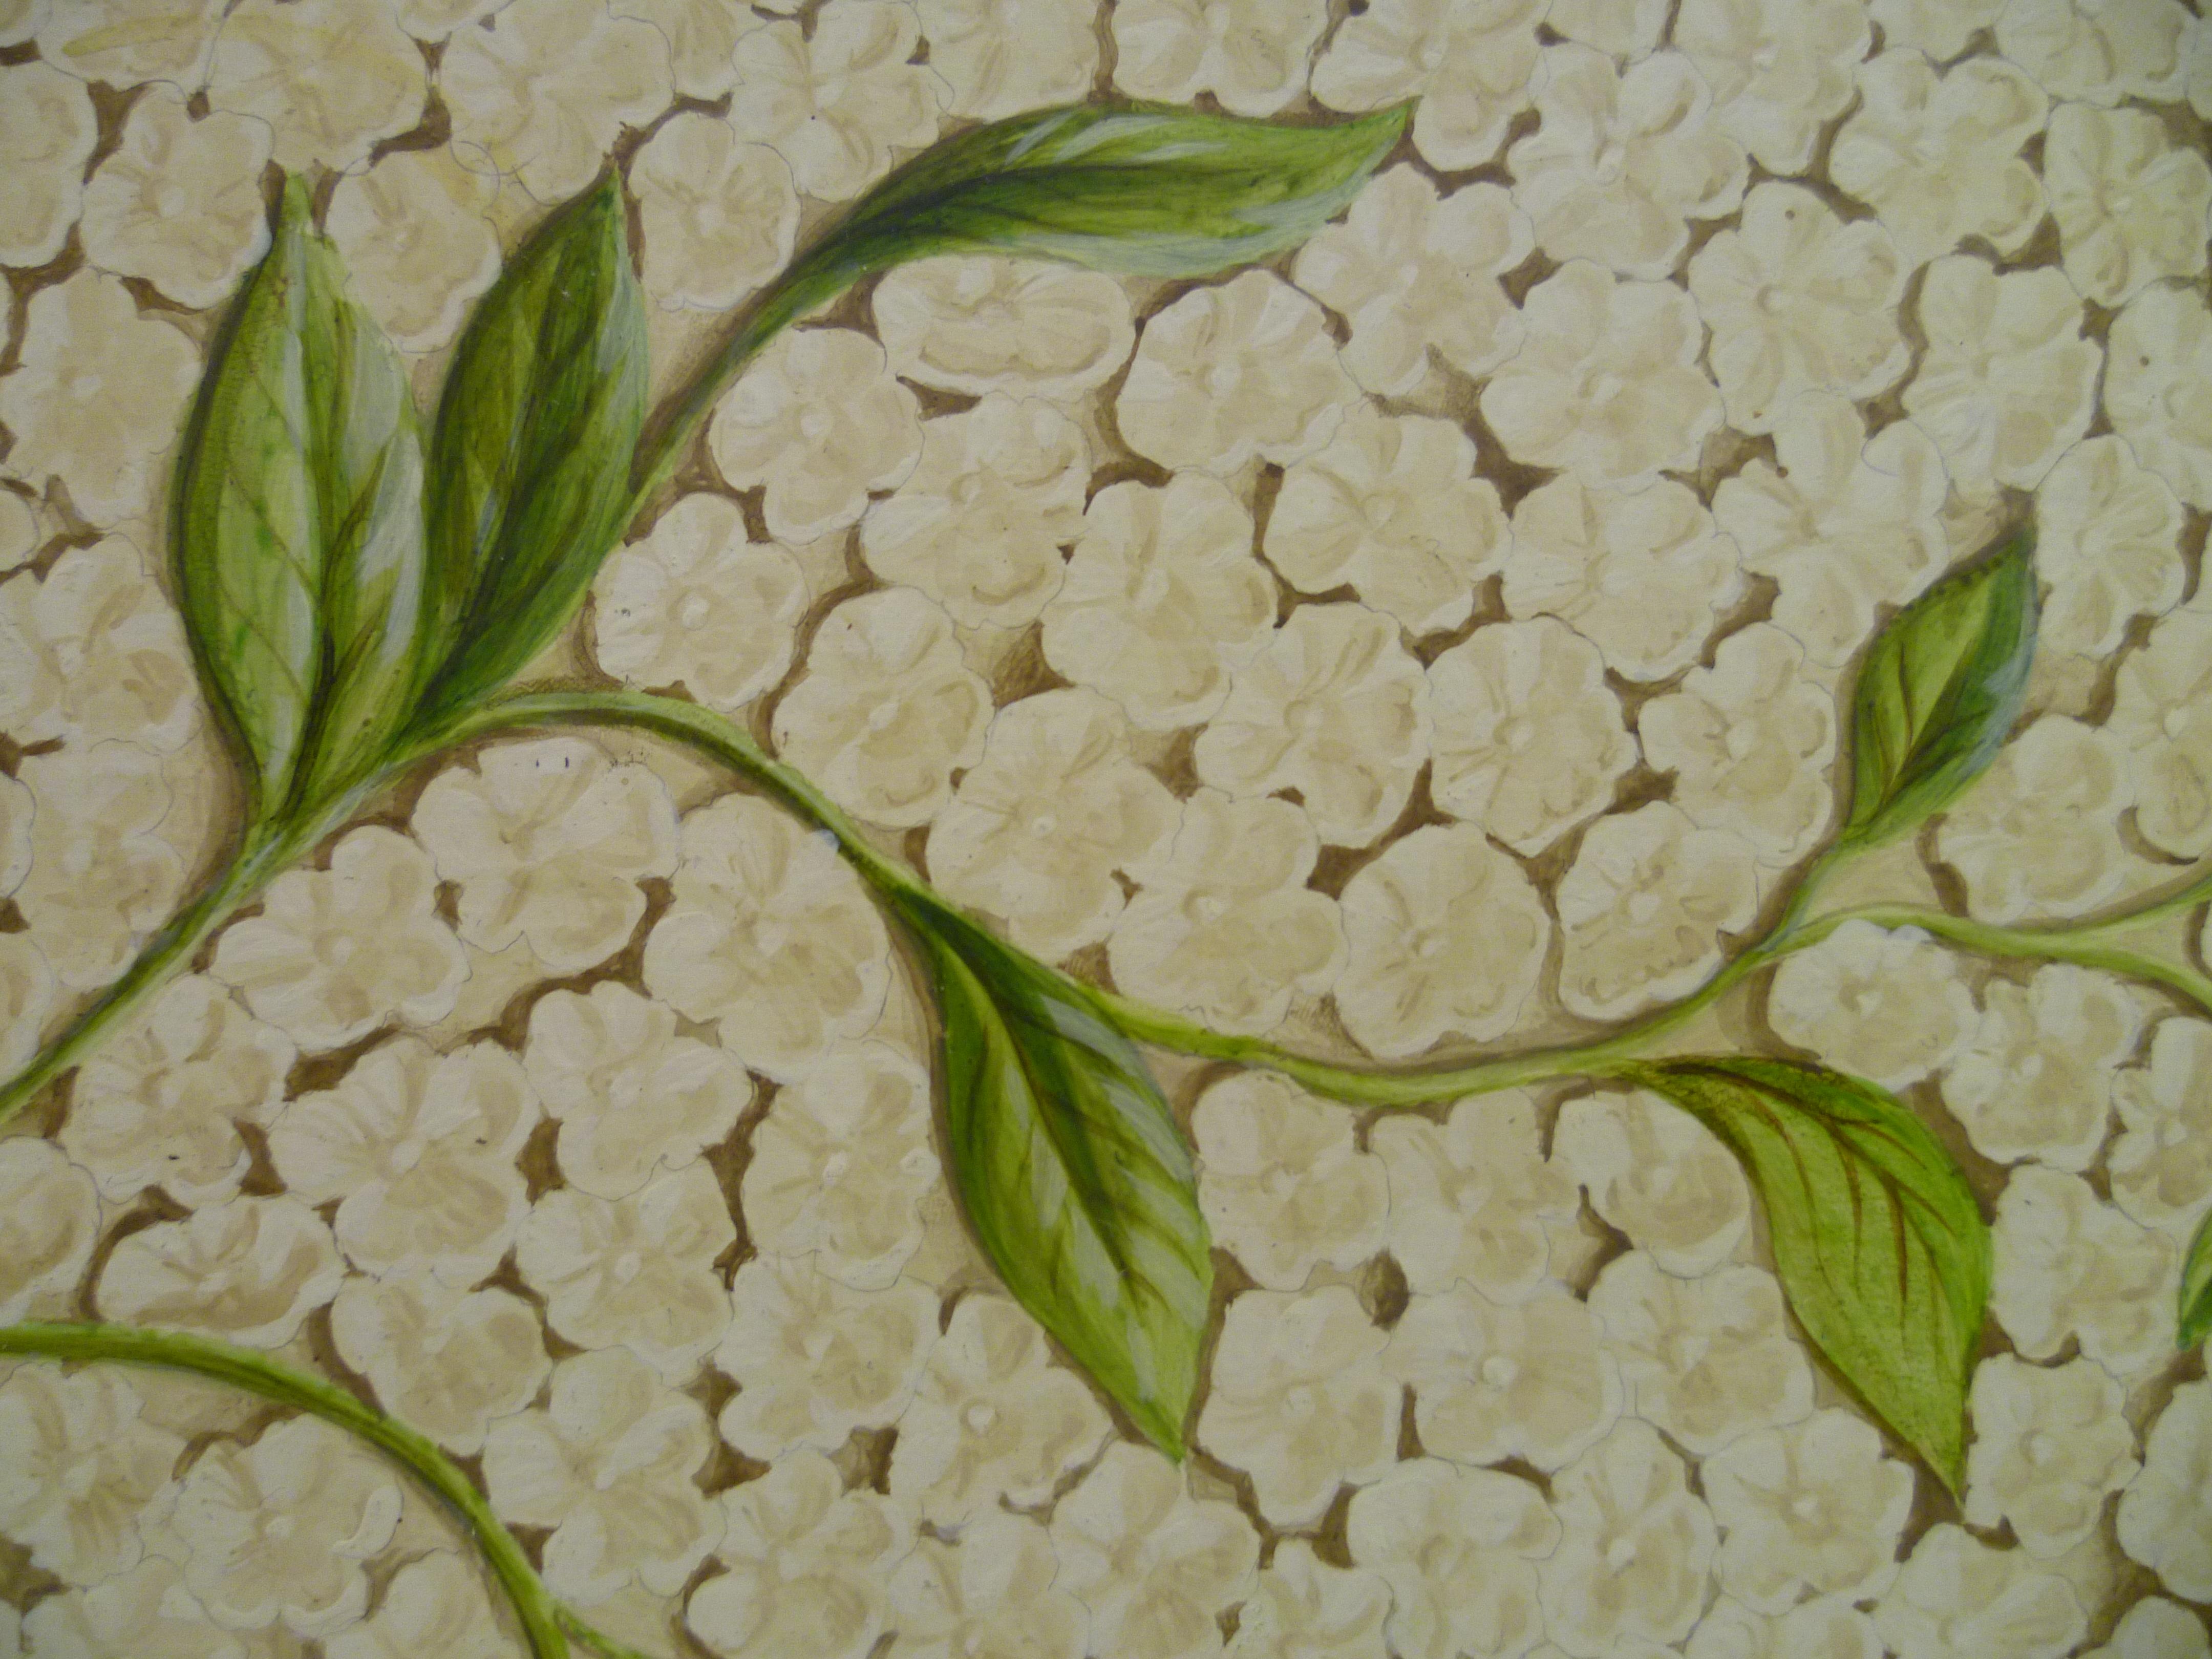 Stone Flowers detail